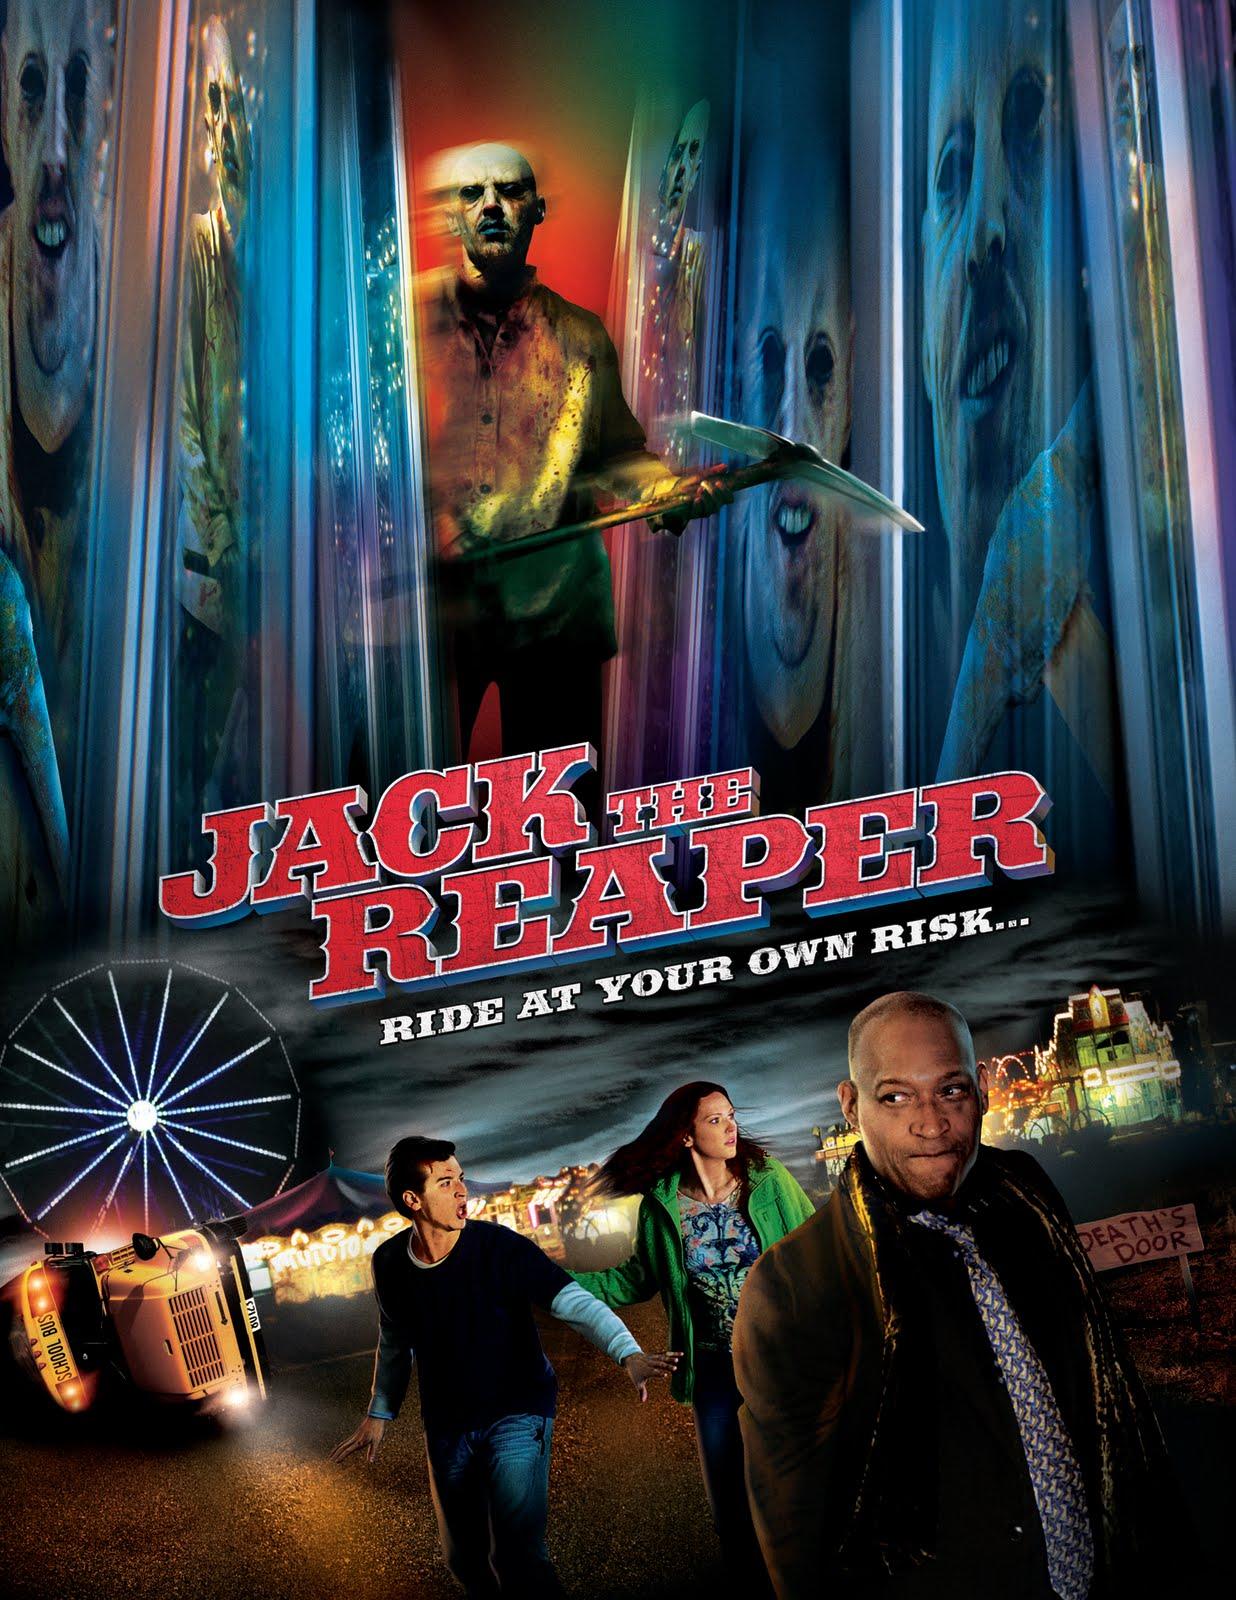 Jack the Reaper movie